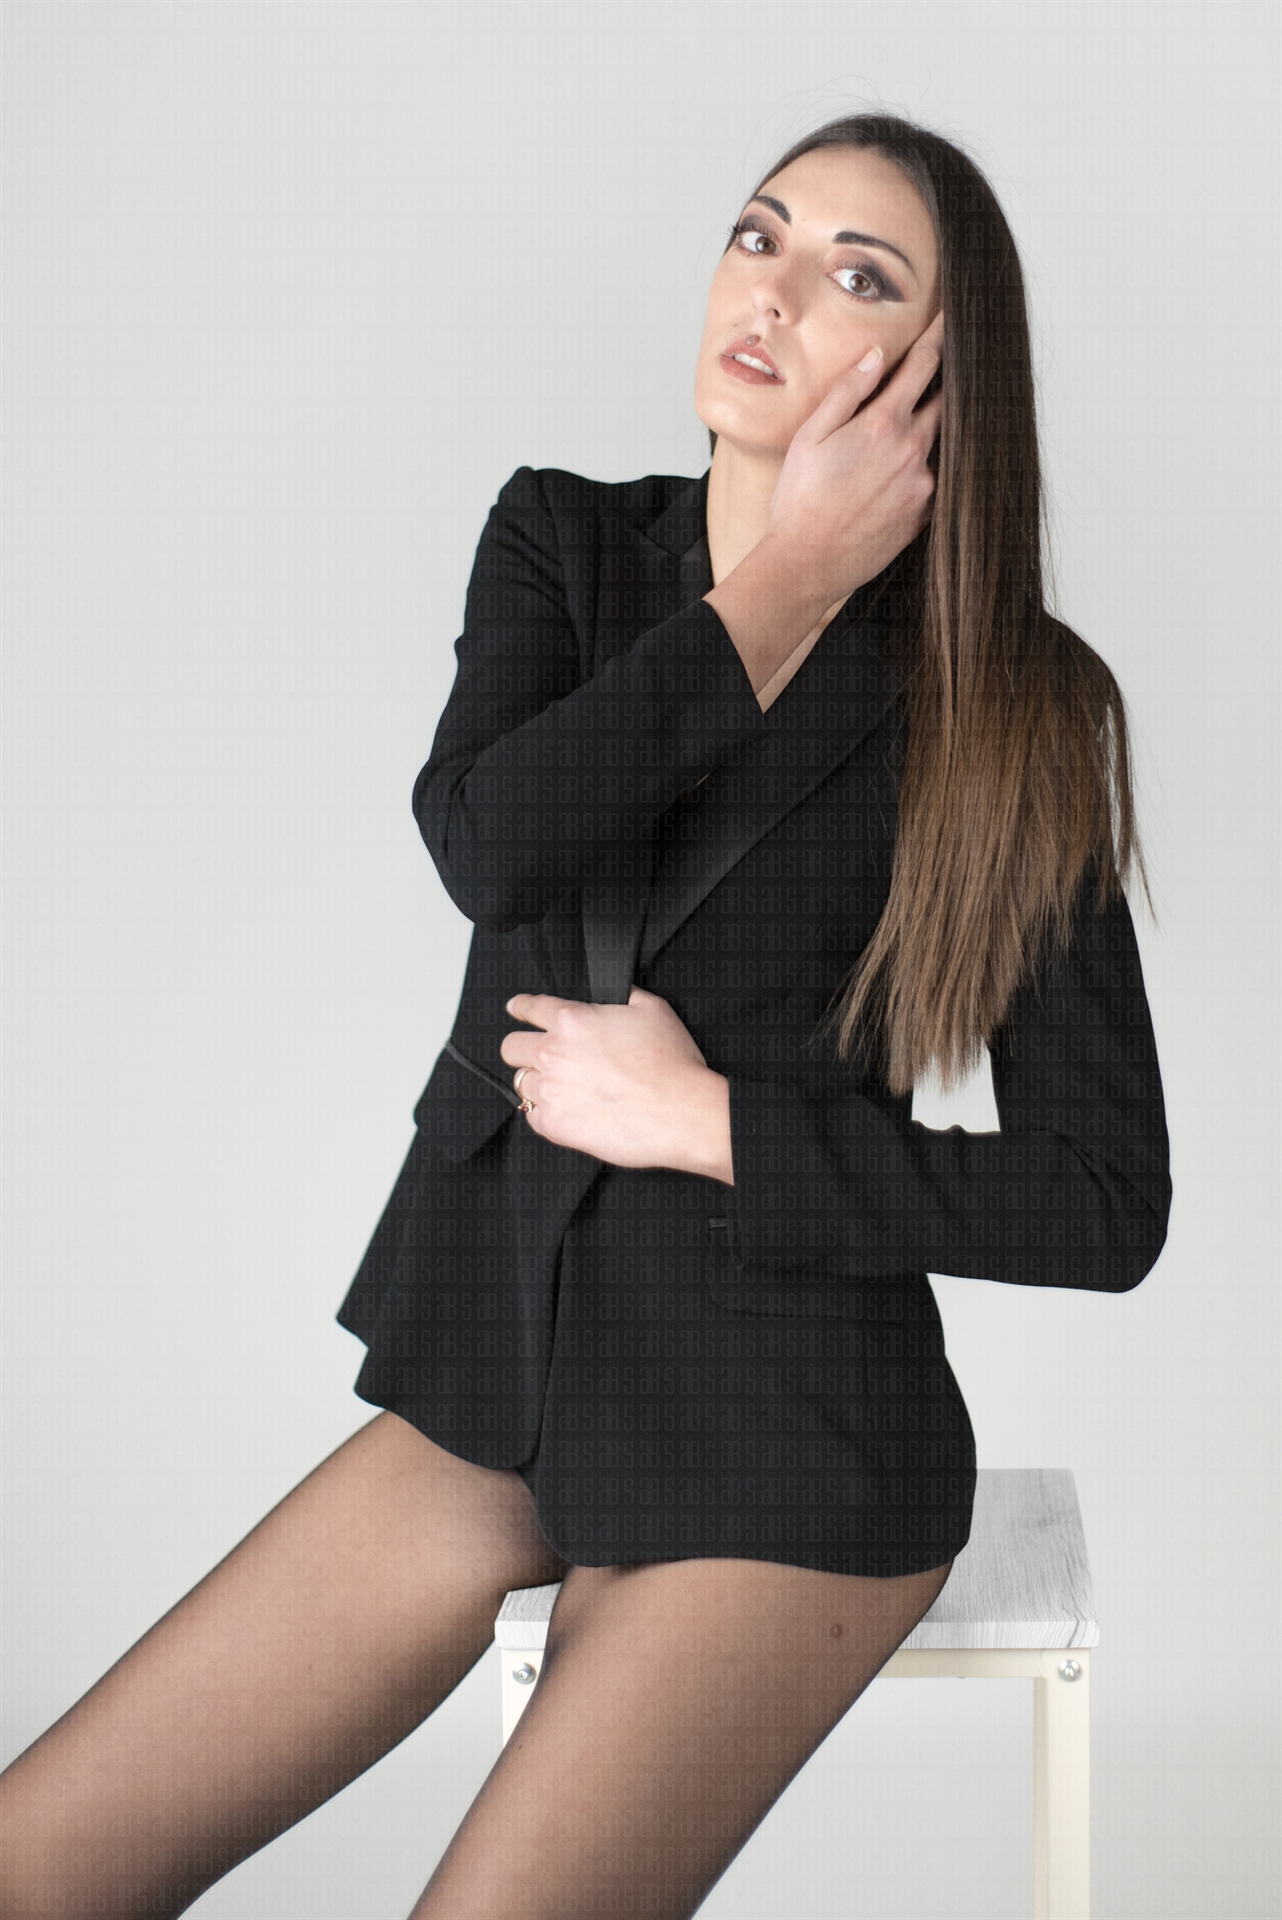 Promo shooting - Arianna BSA Agency - Moda Fotografia Eventi